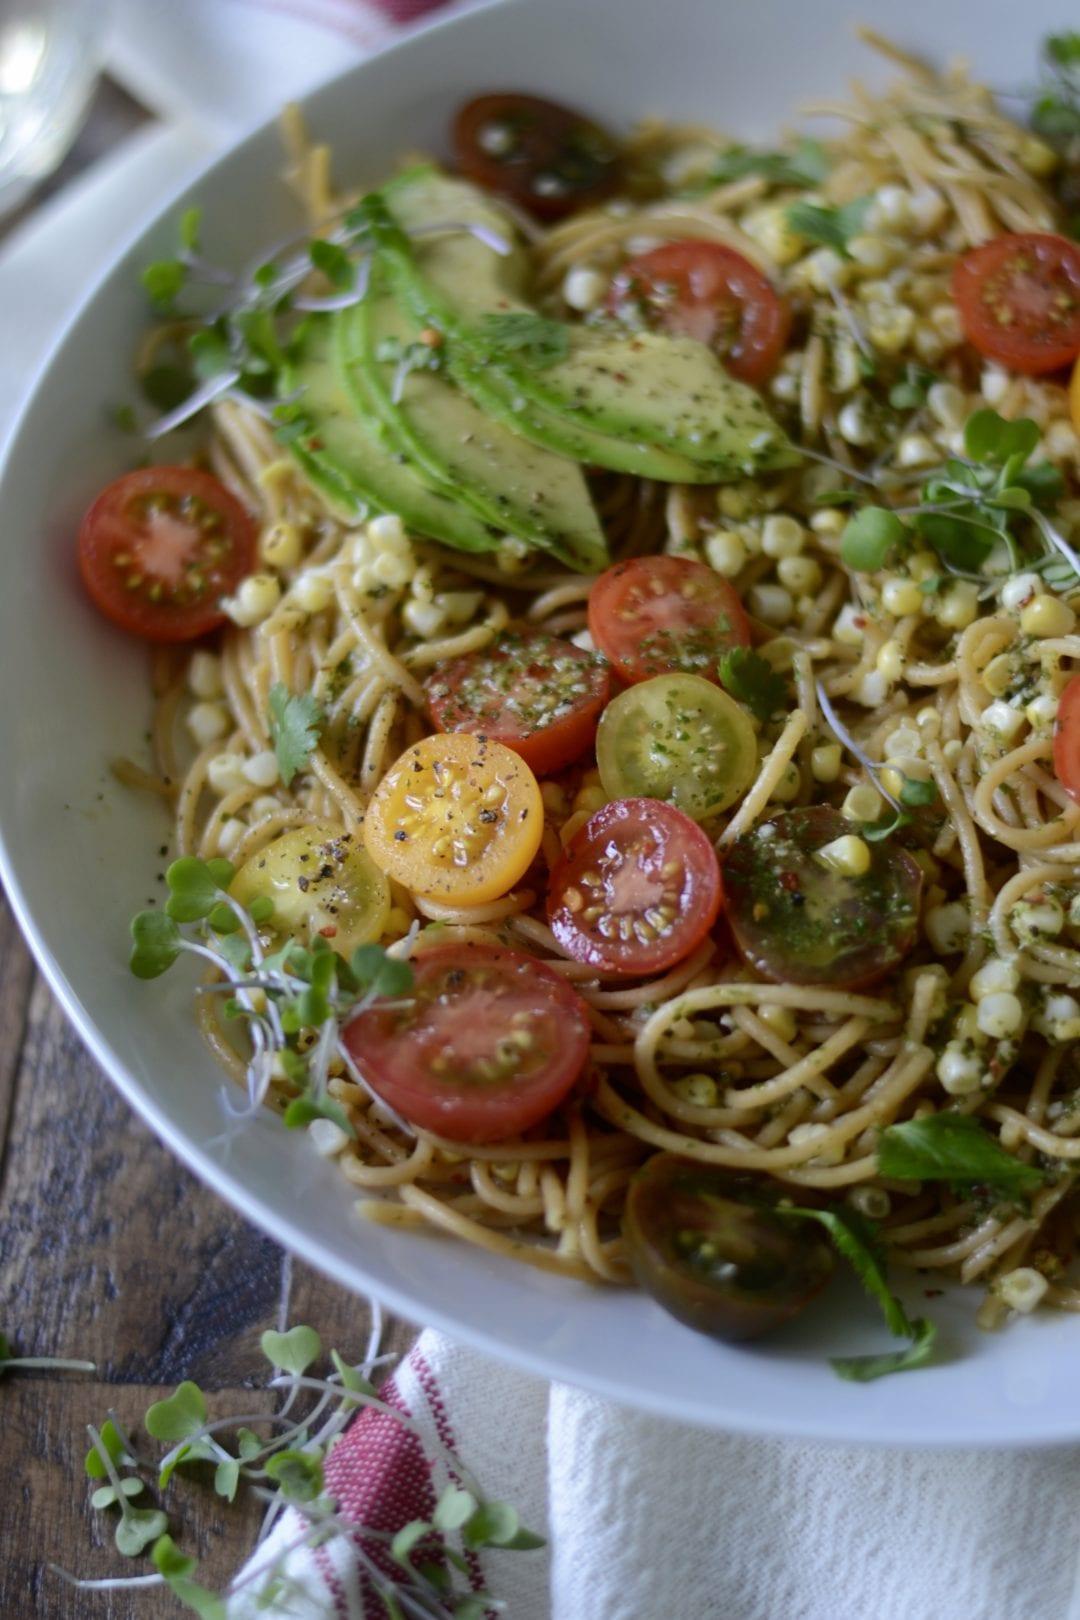 Charred Corn And Avocado Salad With Lime, Chili And Tomato Recipe ...